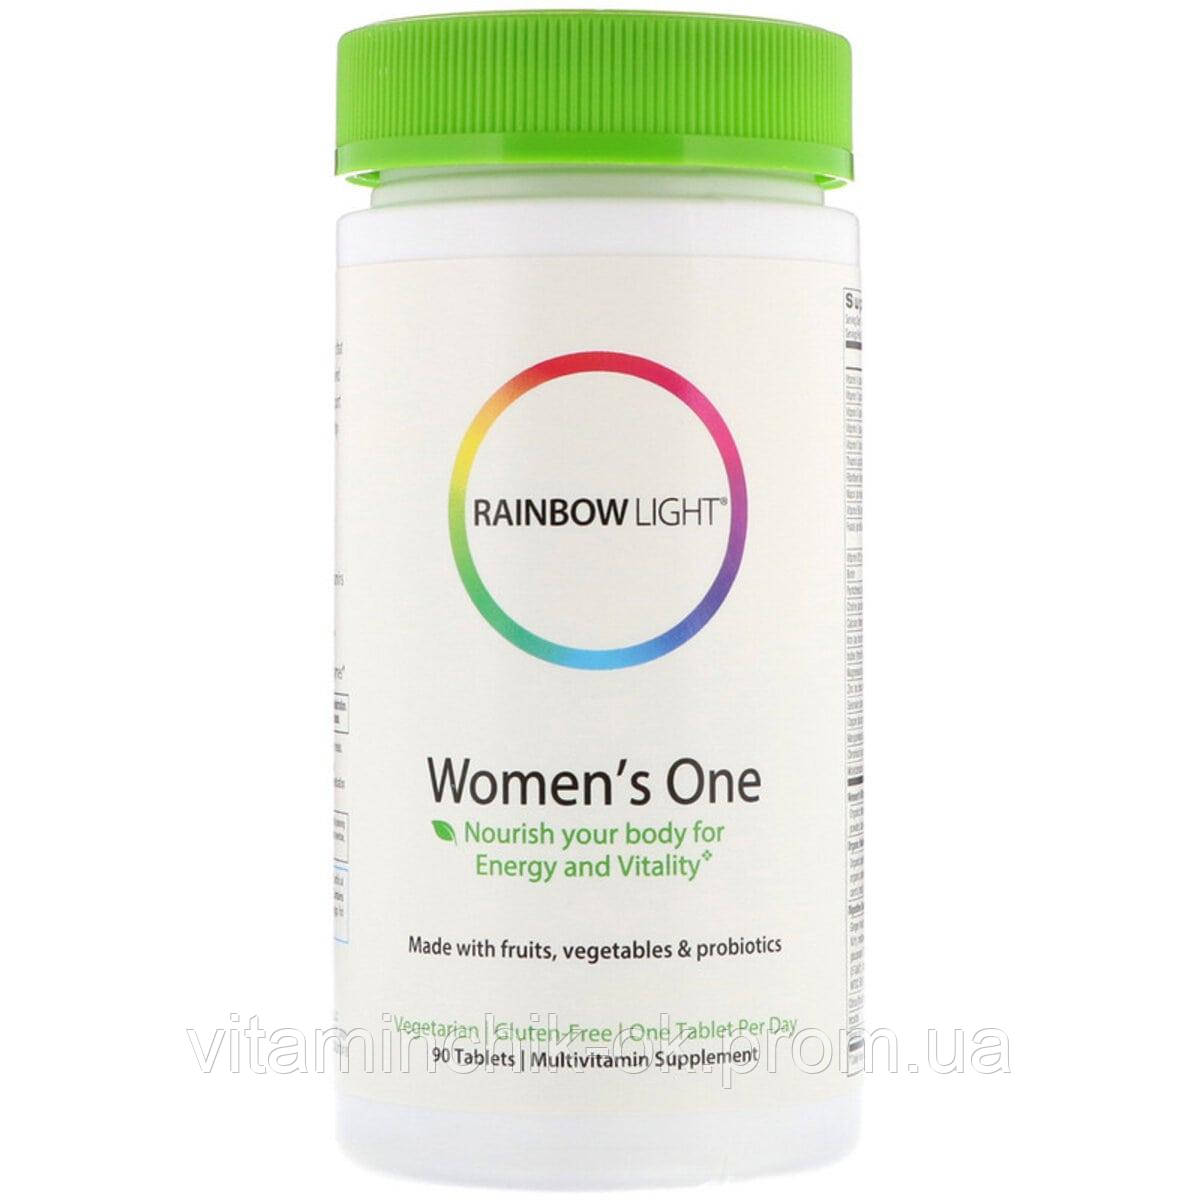 Мультивитамины для Женщин, Women's One, Rainbow Light, 90 таблеток